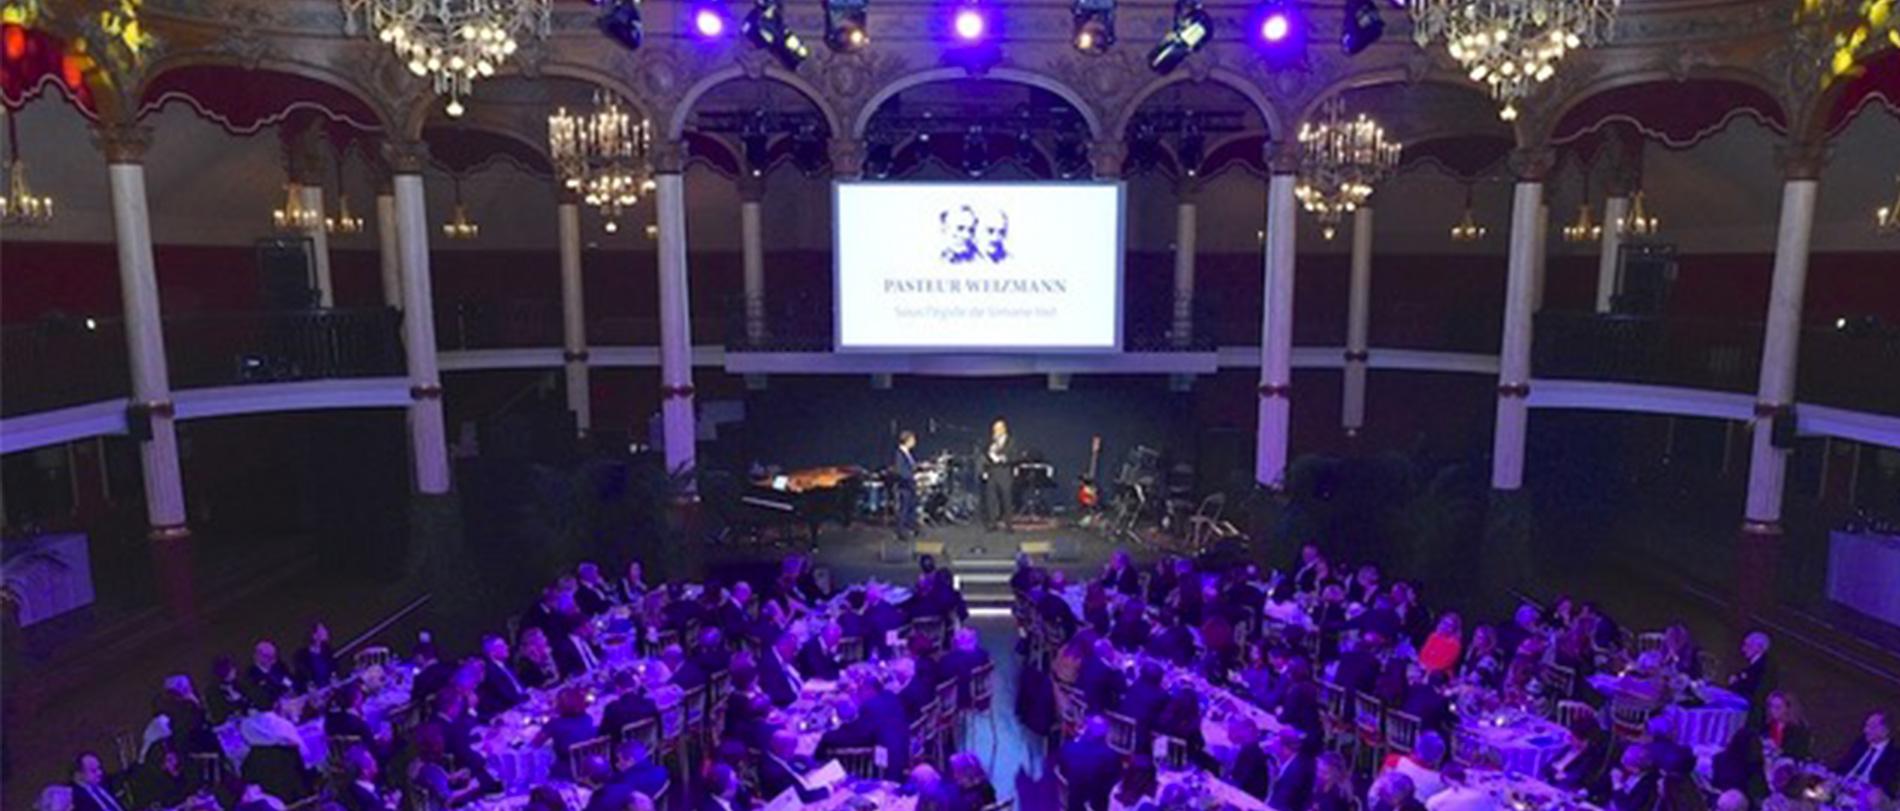 Dîner de Gala du Conseil Pasteur-Weizmann